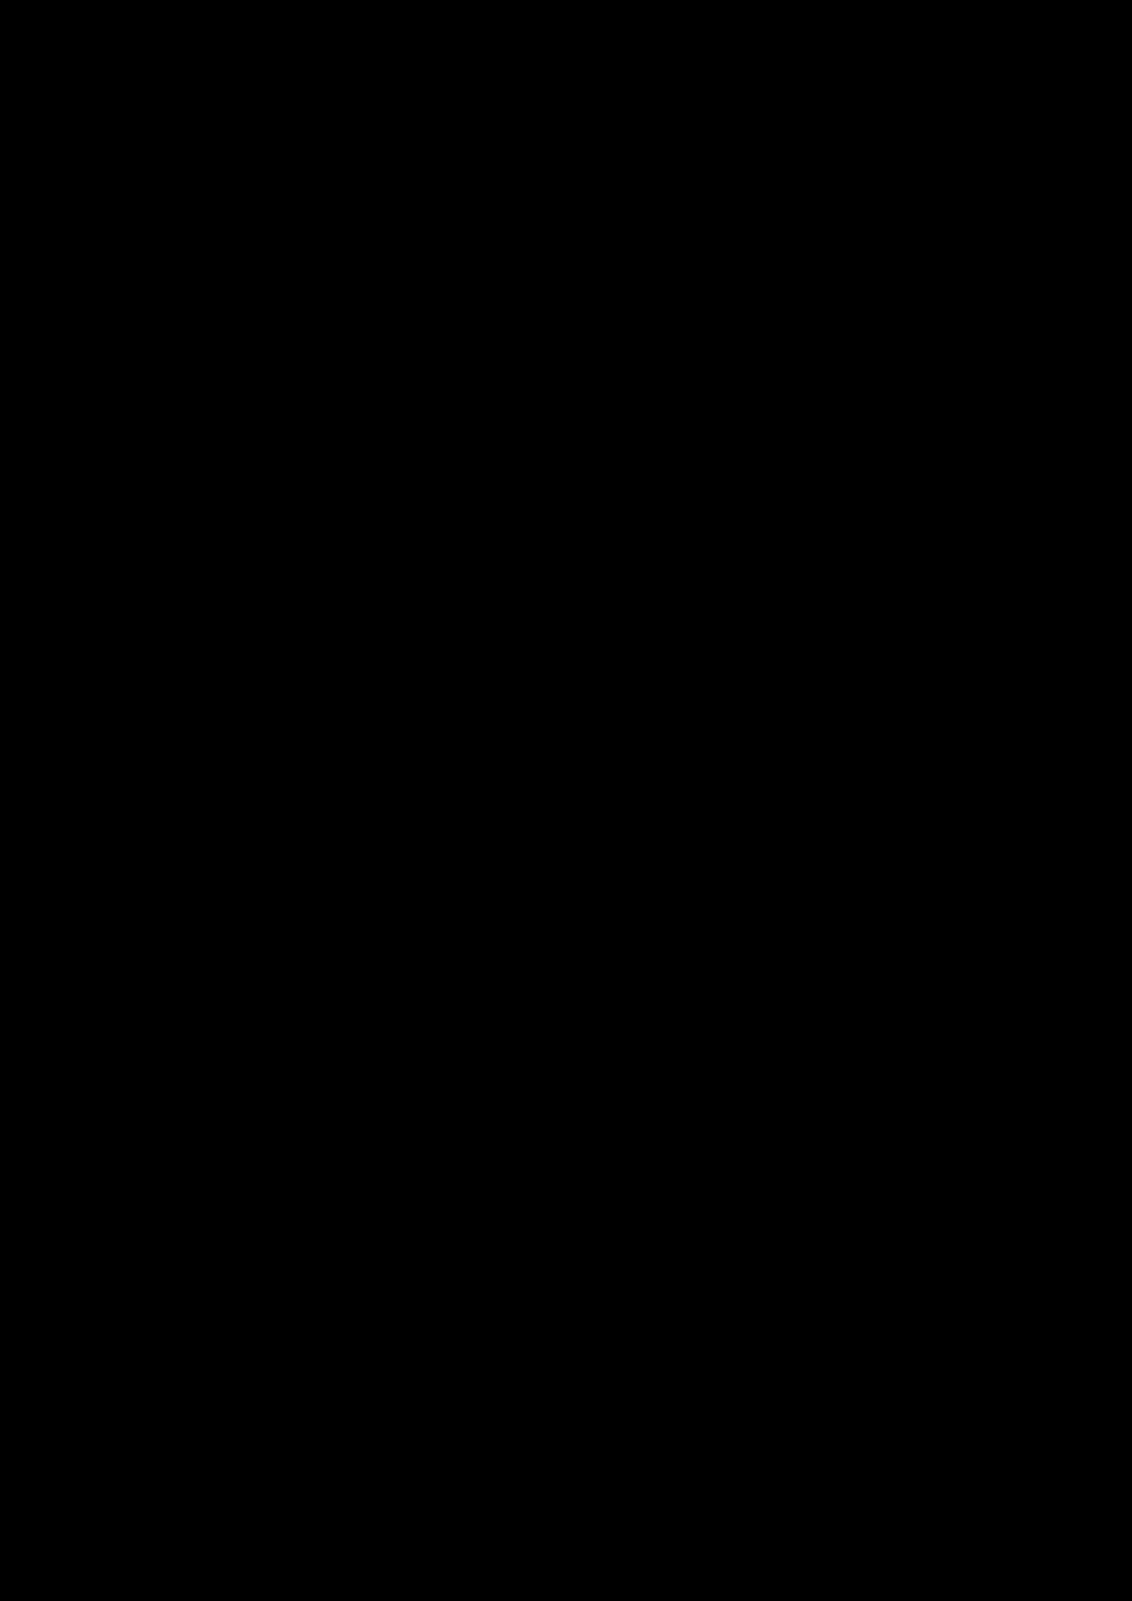 18 berez slide, Image 22